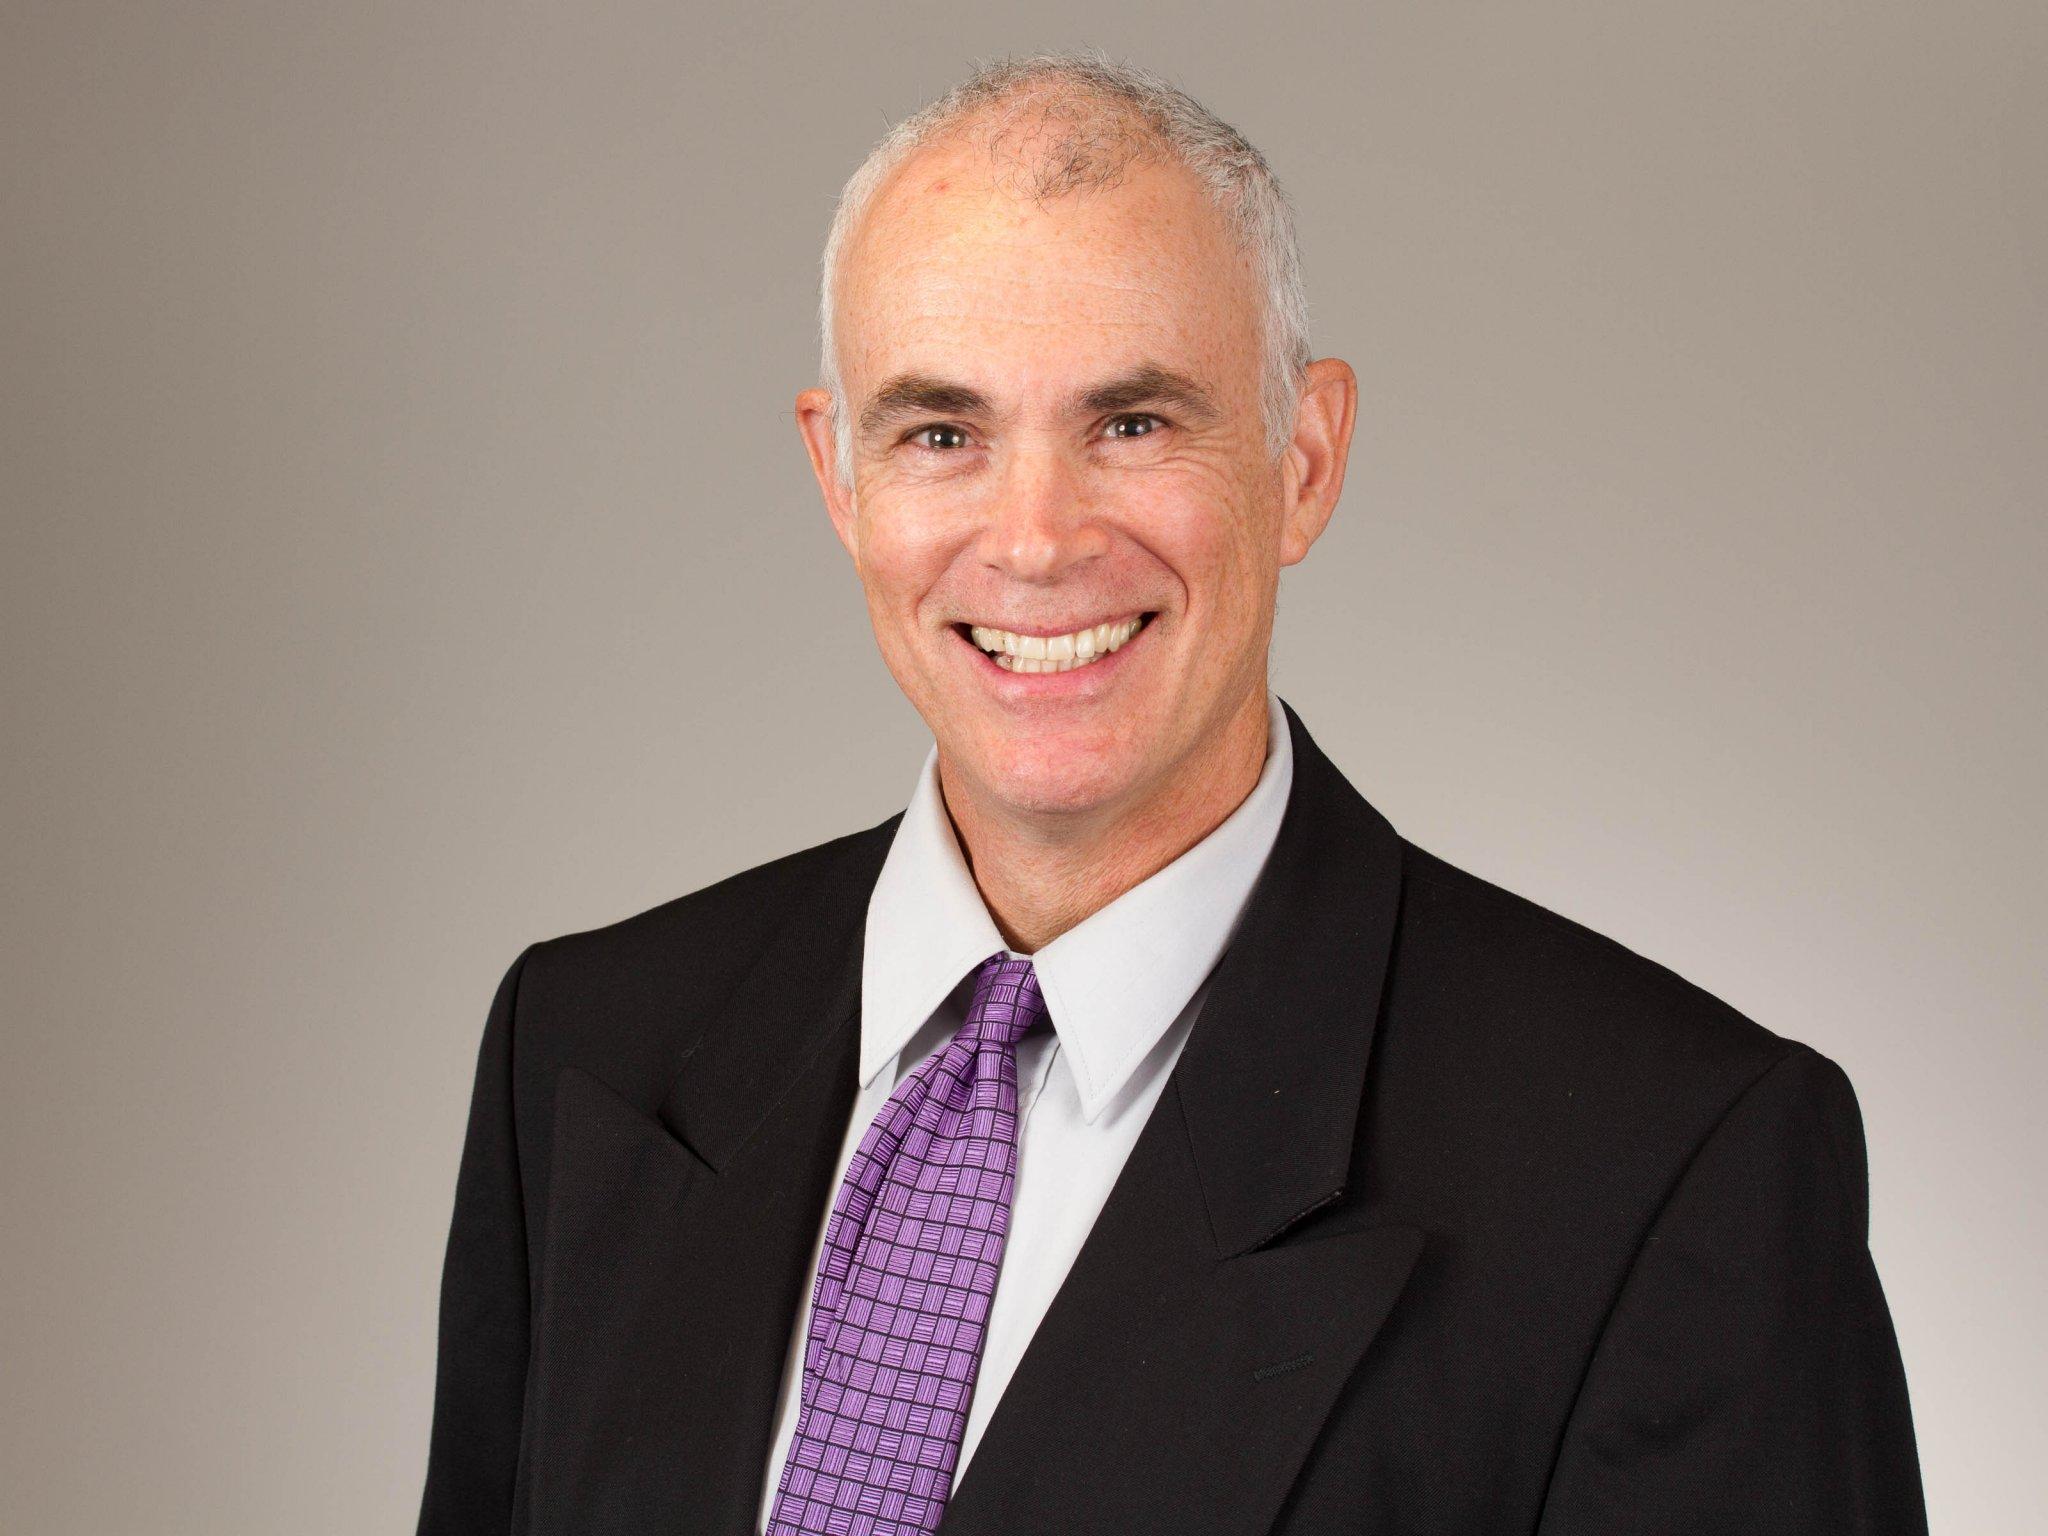 Dr. Eric Crouse